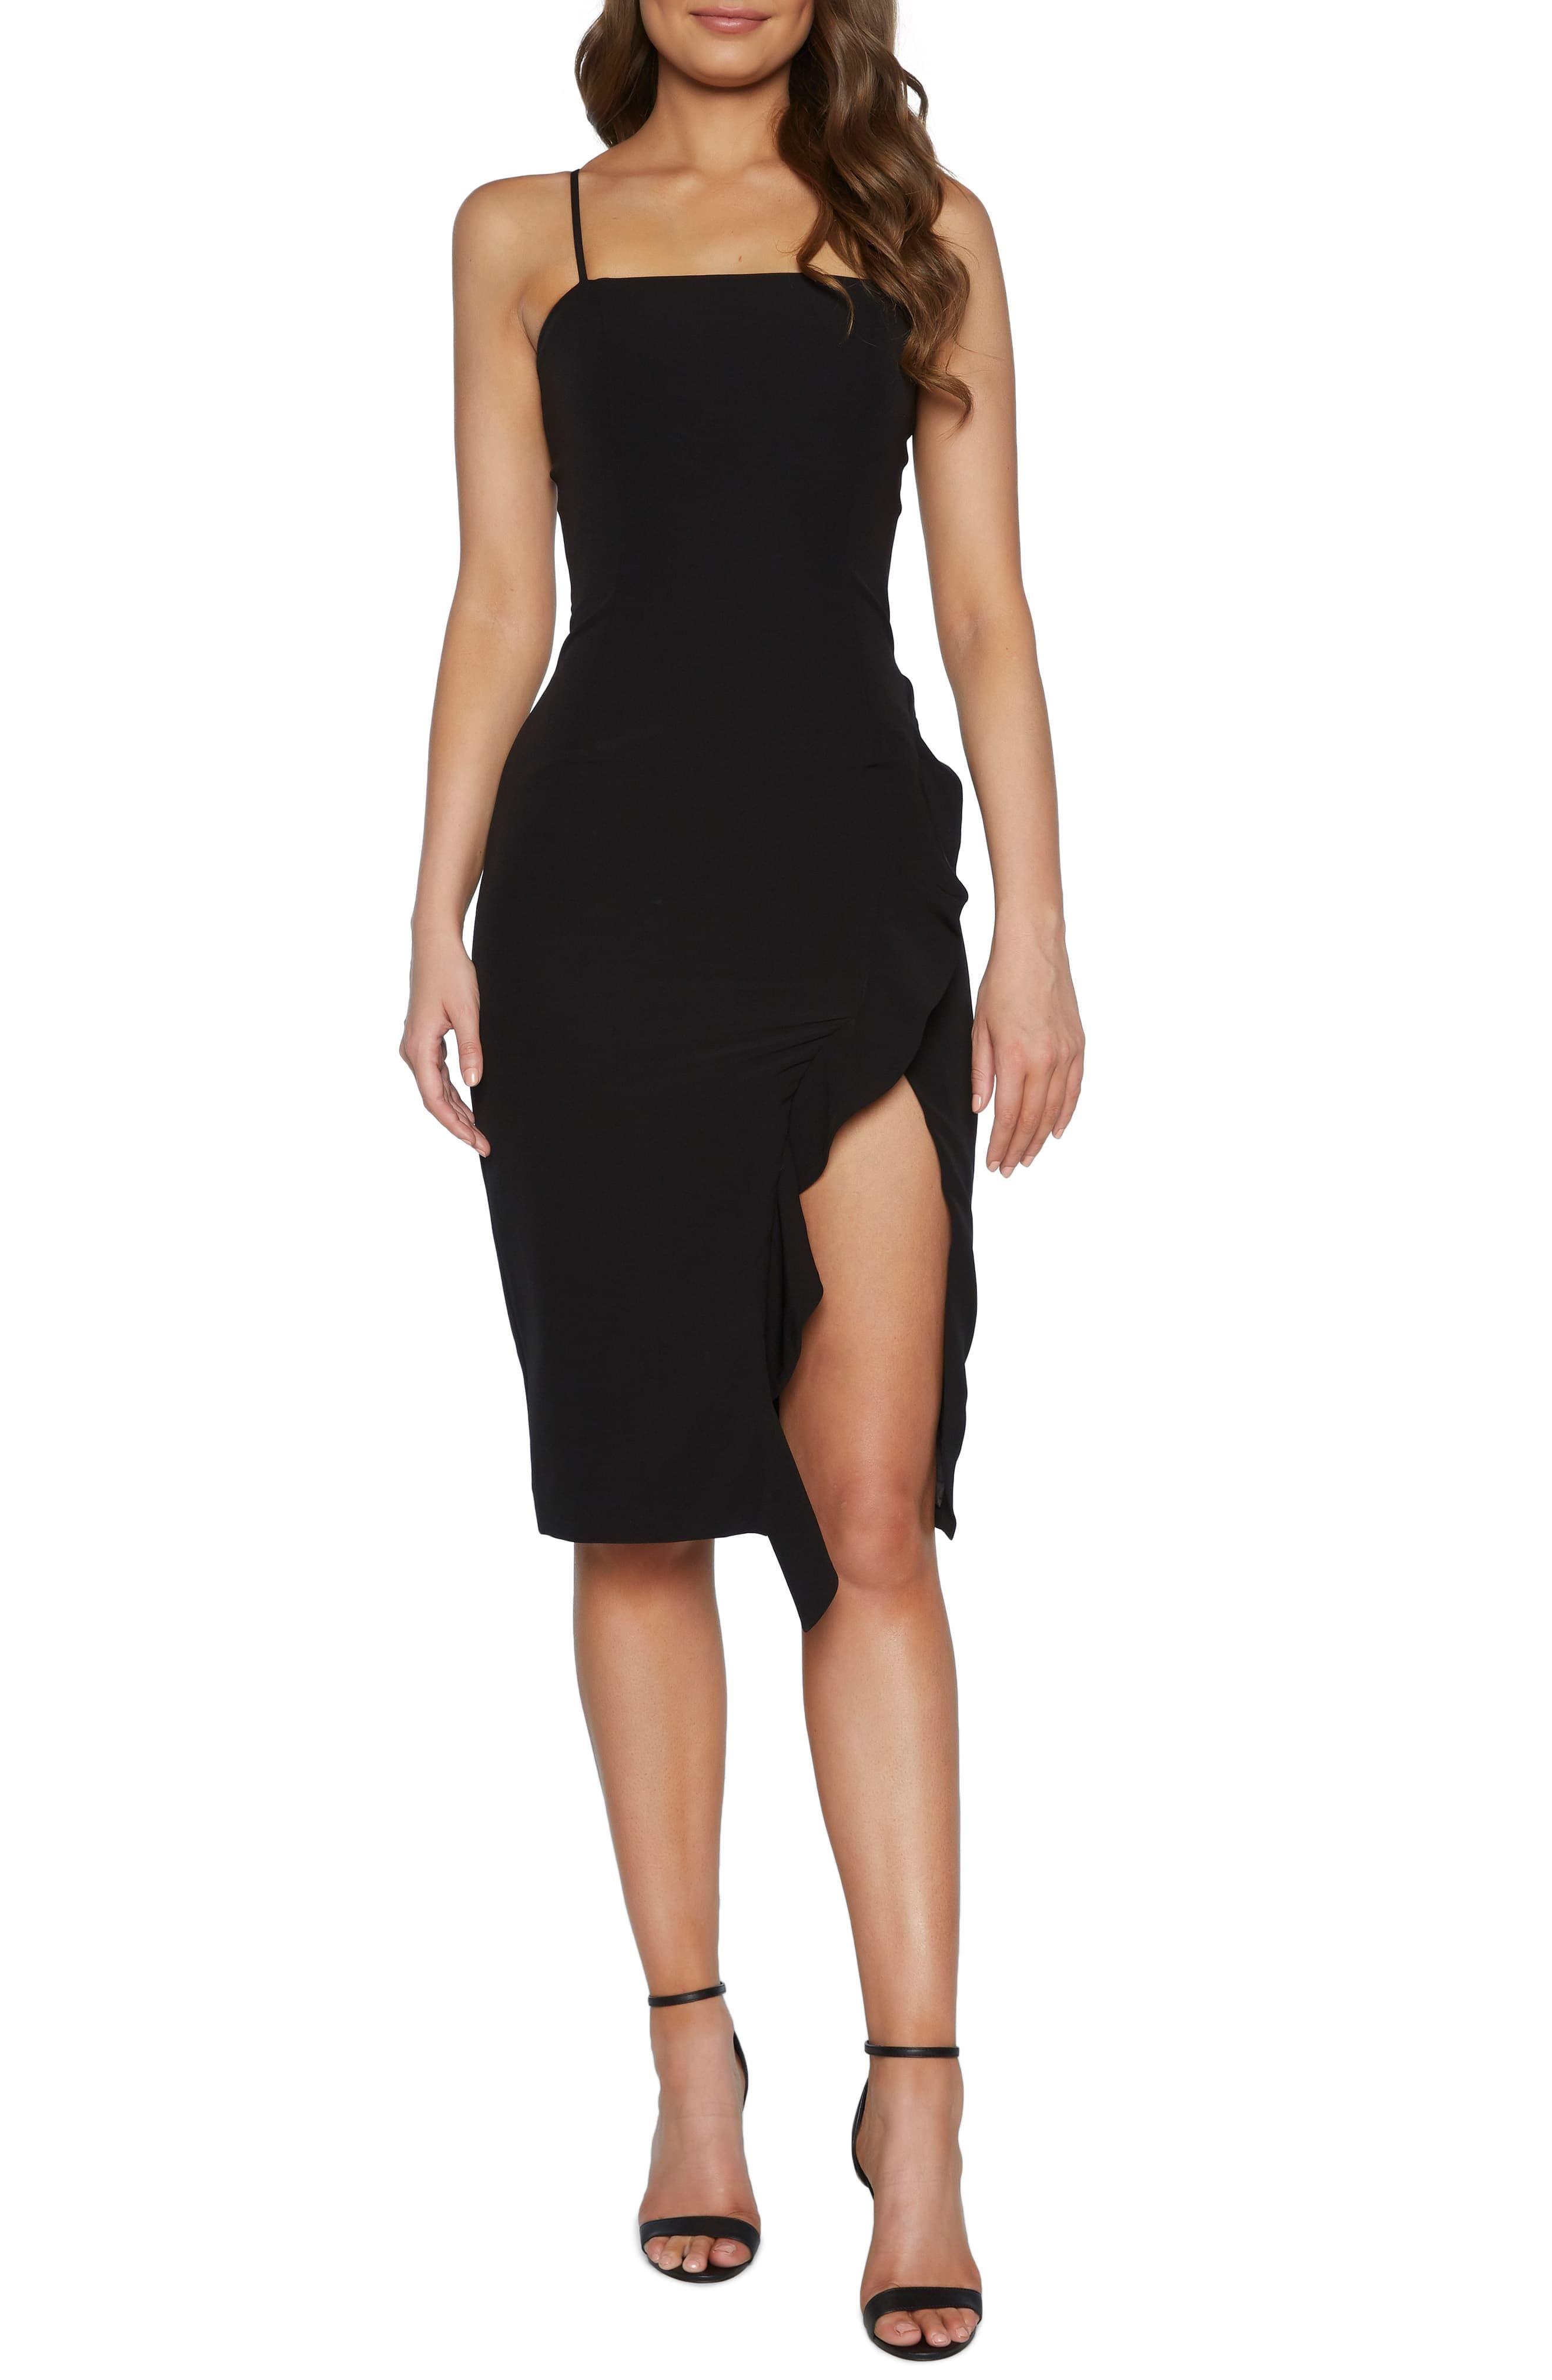 Women S Bardot Carmelle Cocktail Dress Size Small Black In 2021 Red Cocktail Dress Black Cocktail Dress Nordstrom Dresses [ 4048 x 2640 Pixel ]